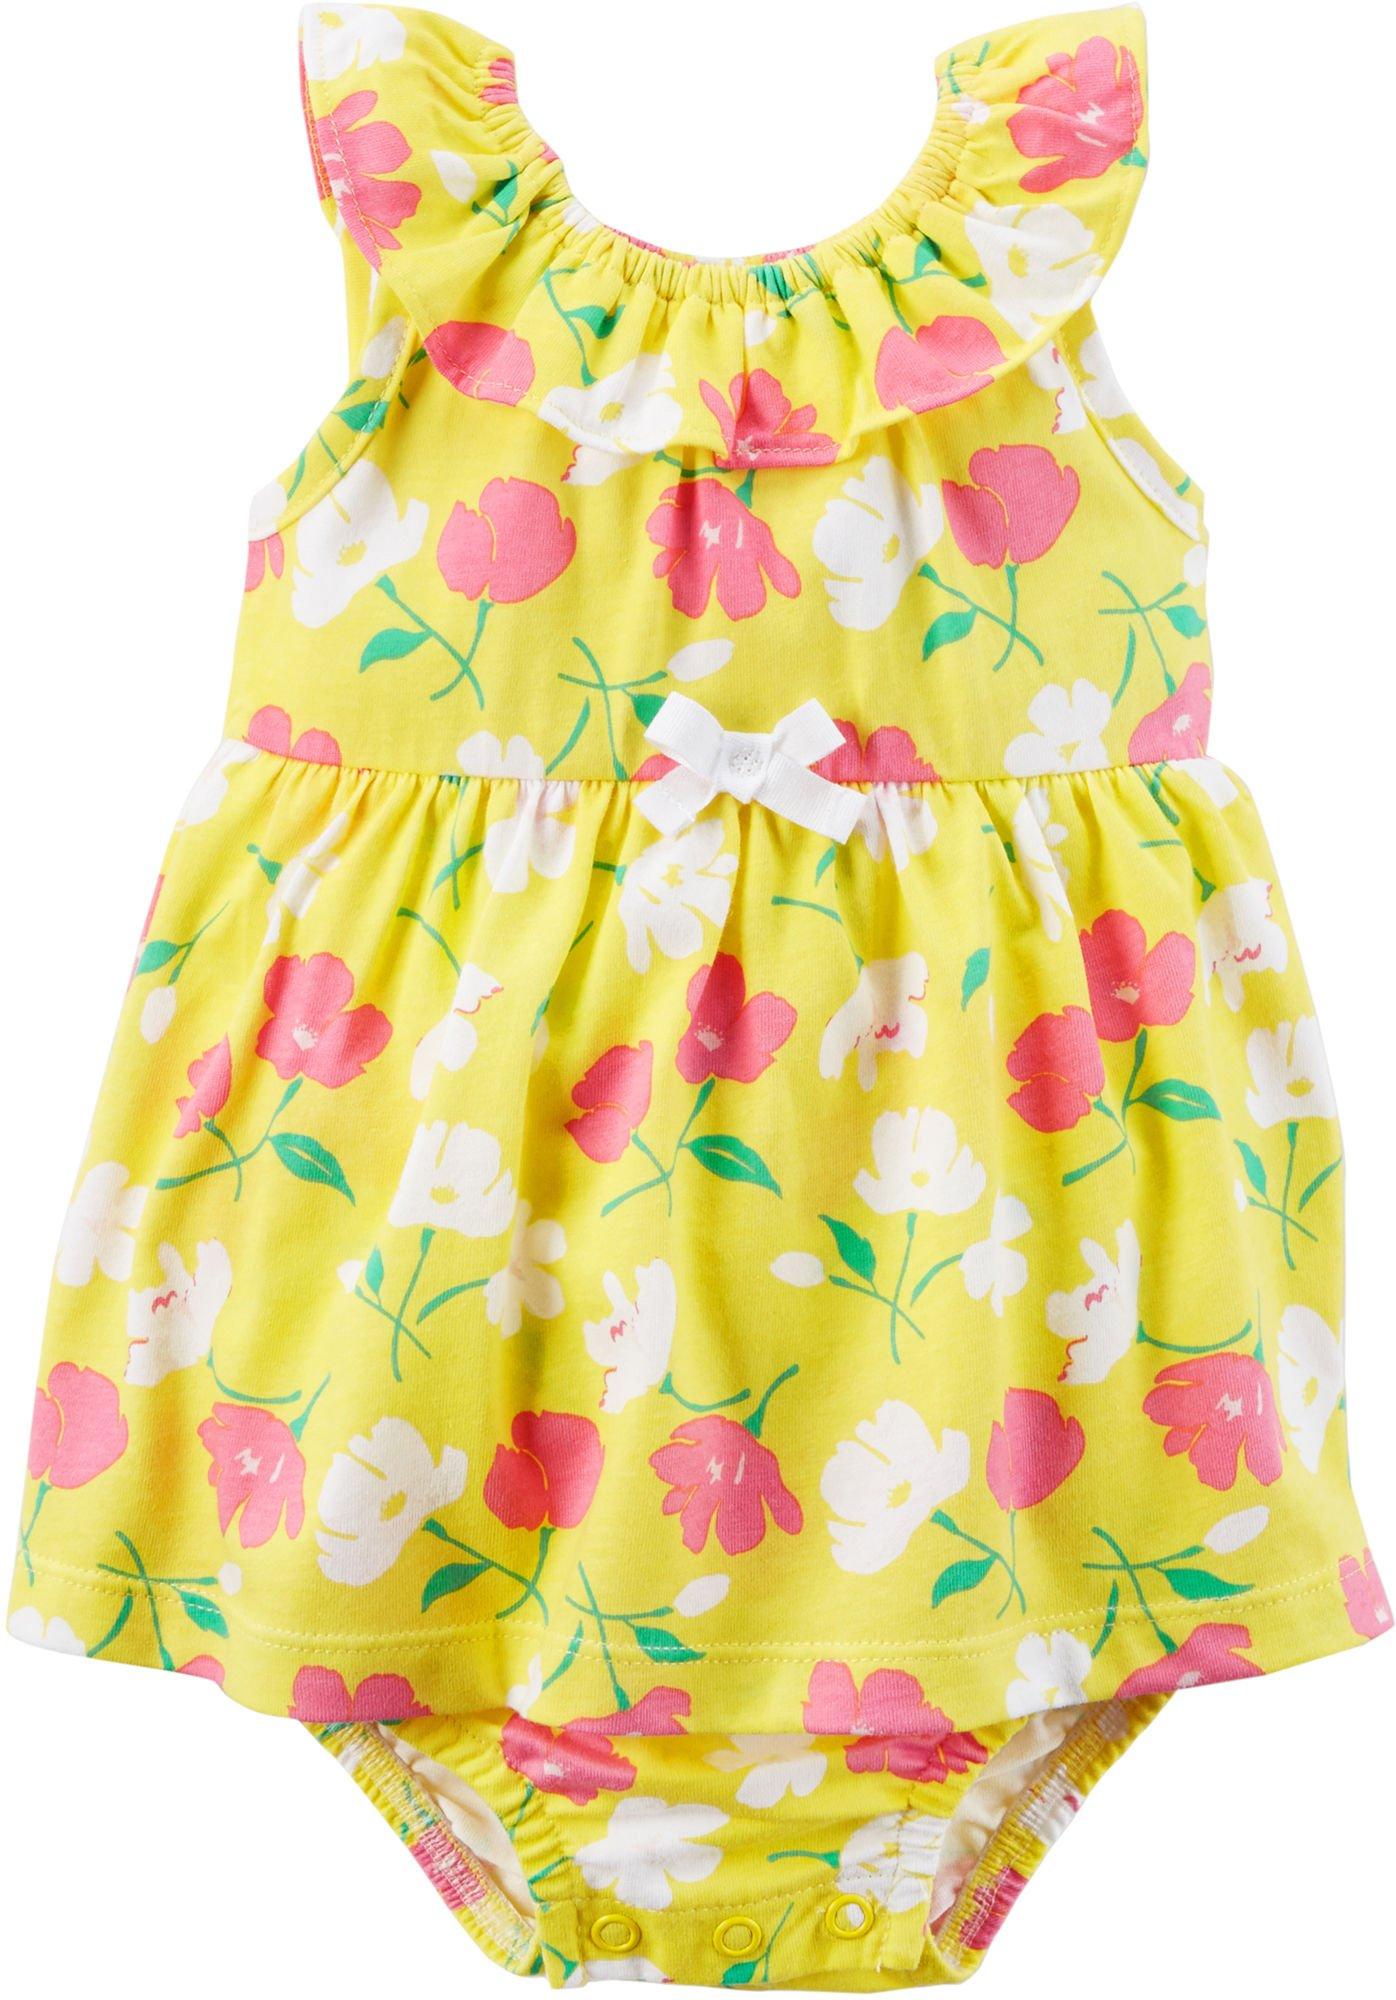 Carter's Baby Girls' Sleeveless Floral Print